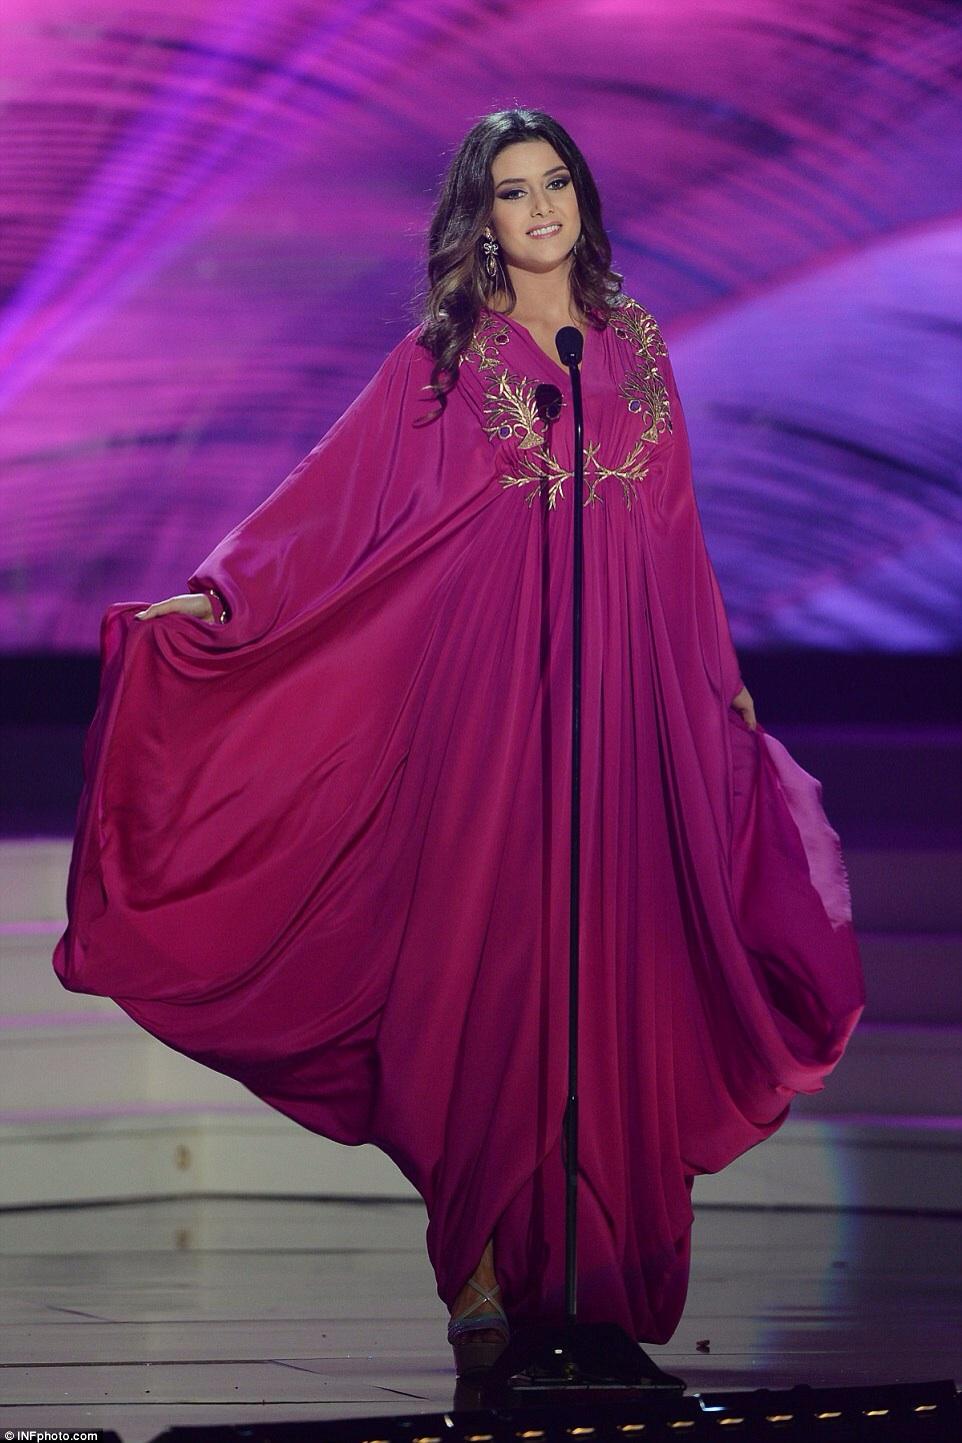 Miss Líbano